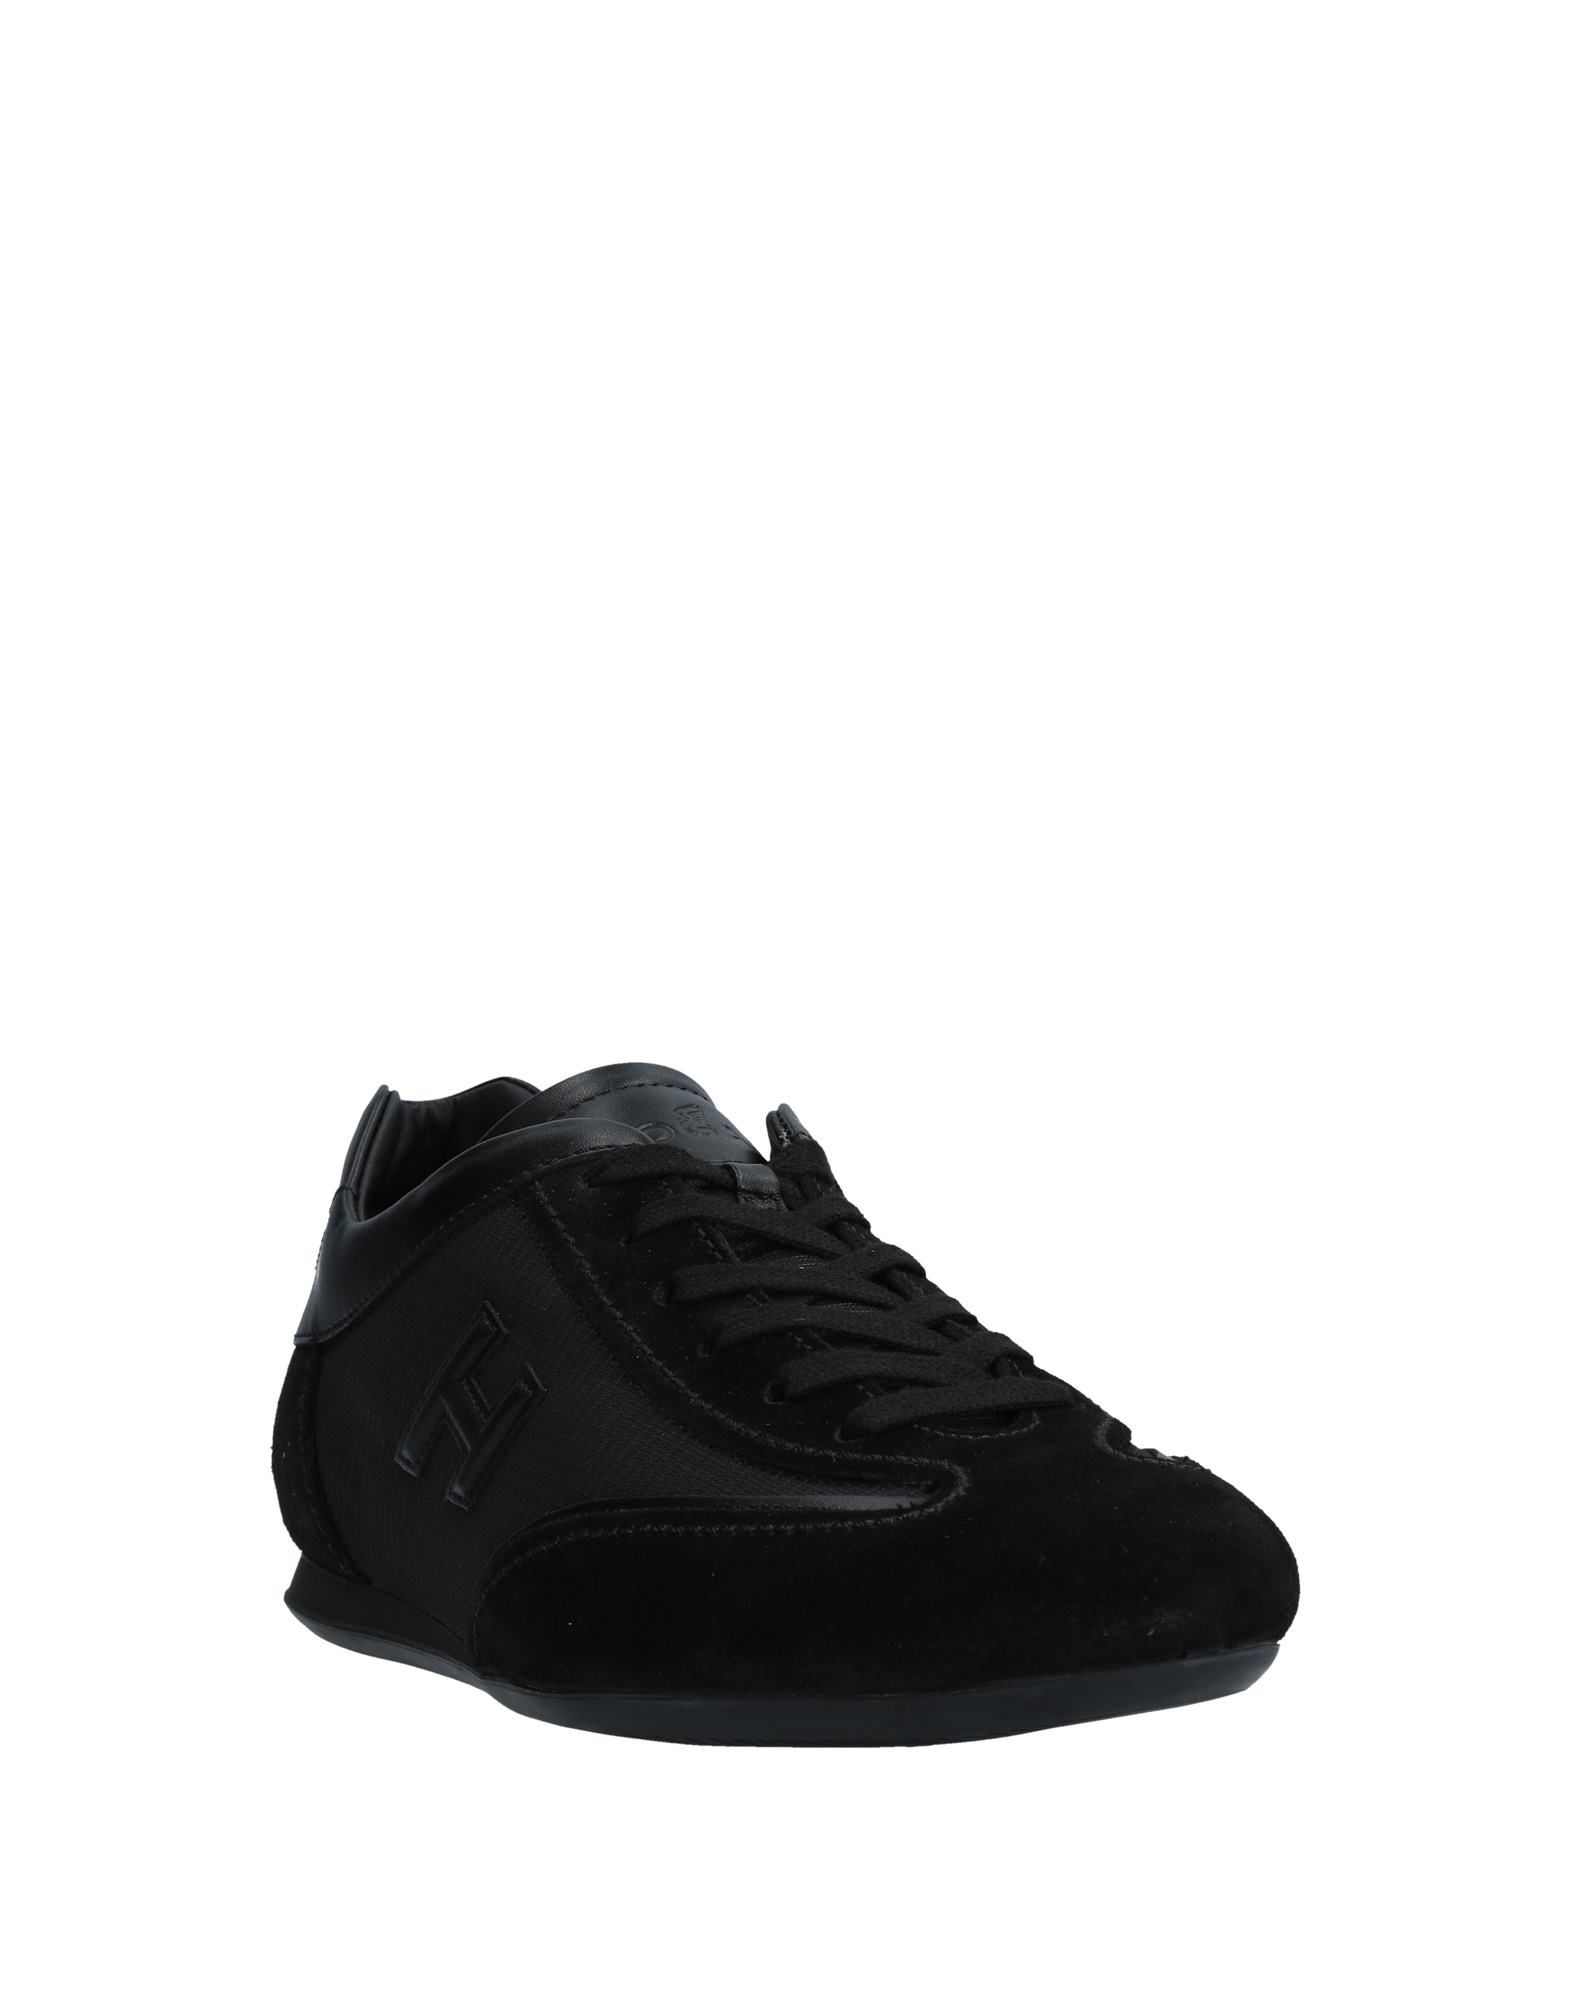 Hogan Sneakers Herren  11541643VN Gute Qualität beliebte Schuhe